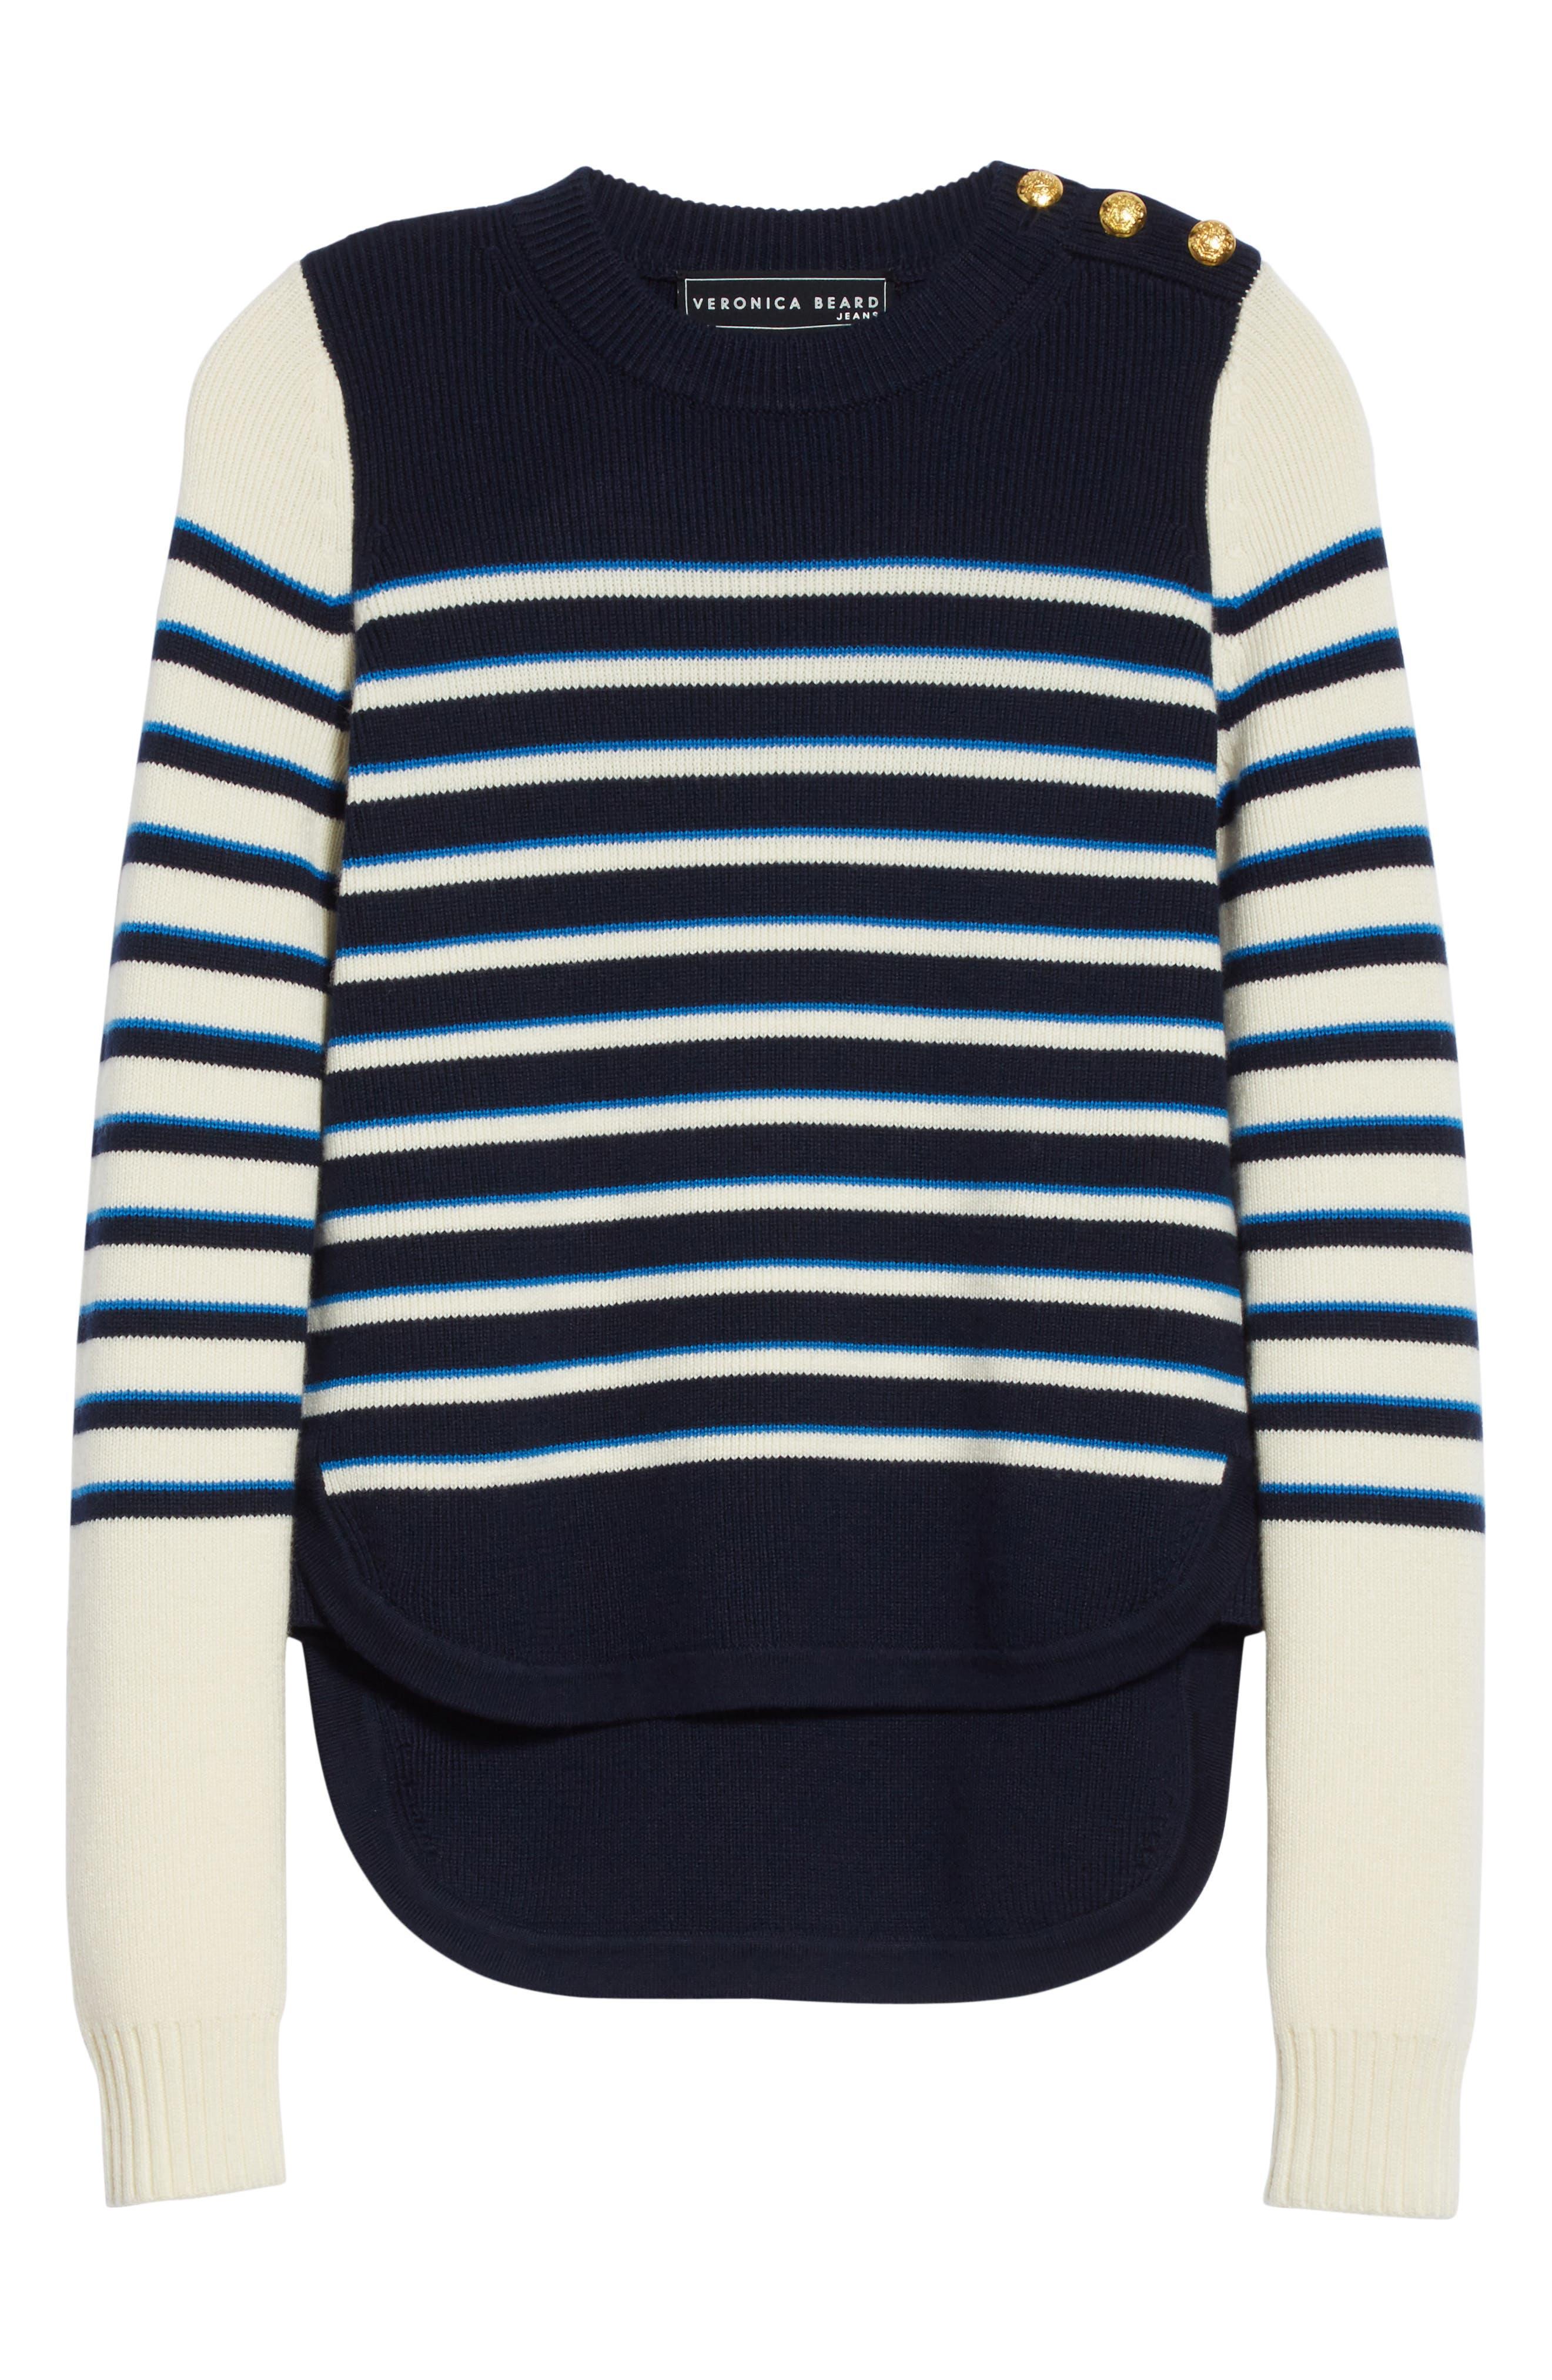 Amos Stripe Merino Wool Sweater,                             Alternate thumbnail 6, color,                             Navy/ Ivory/ Blue